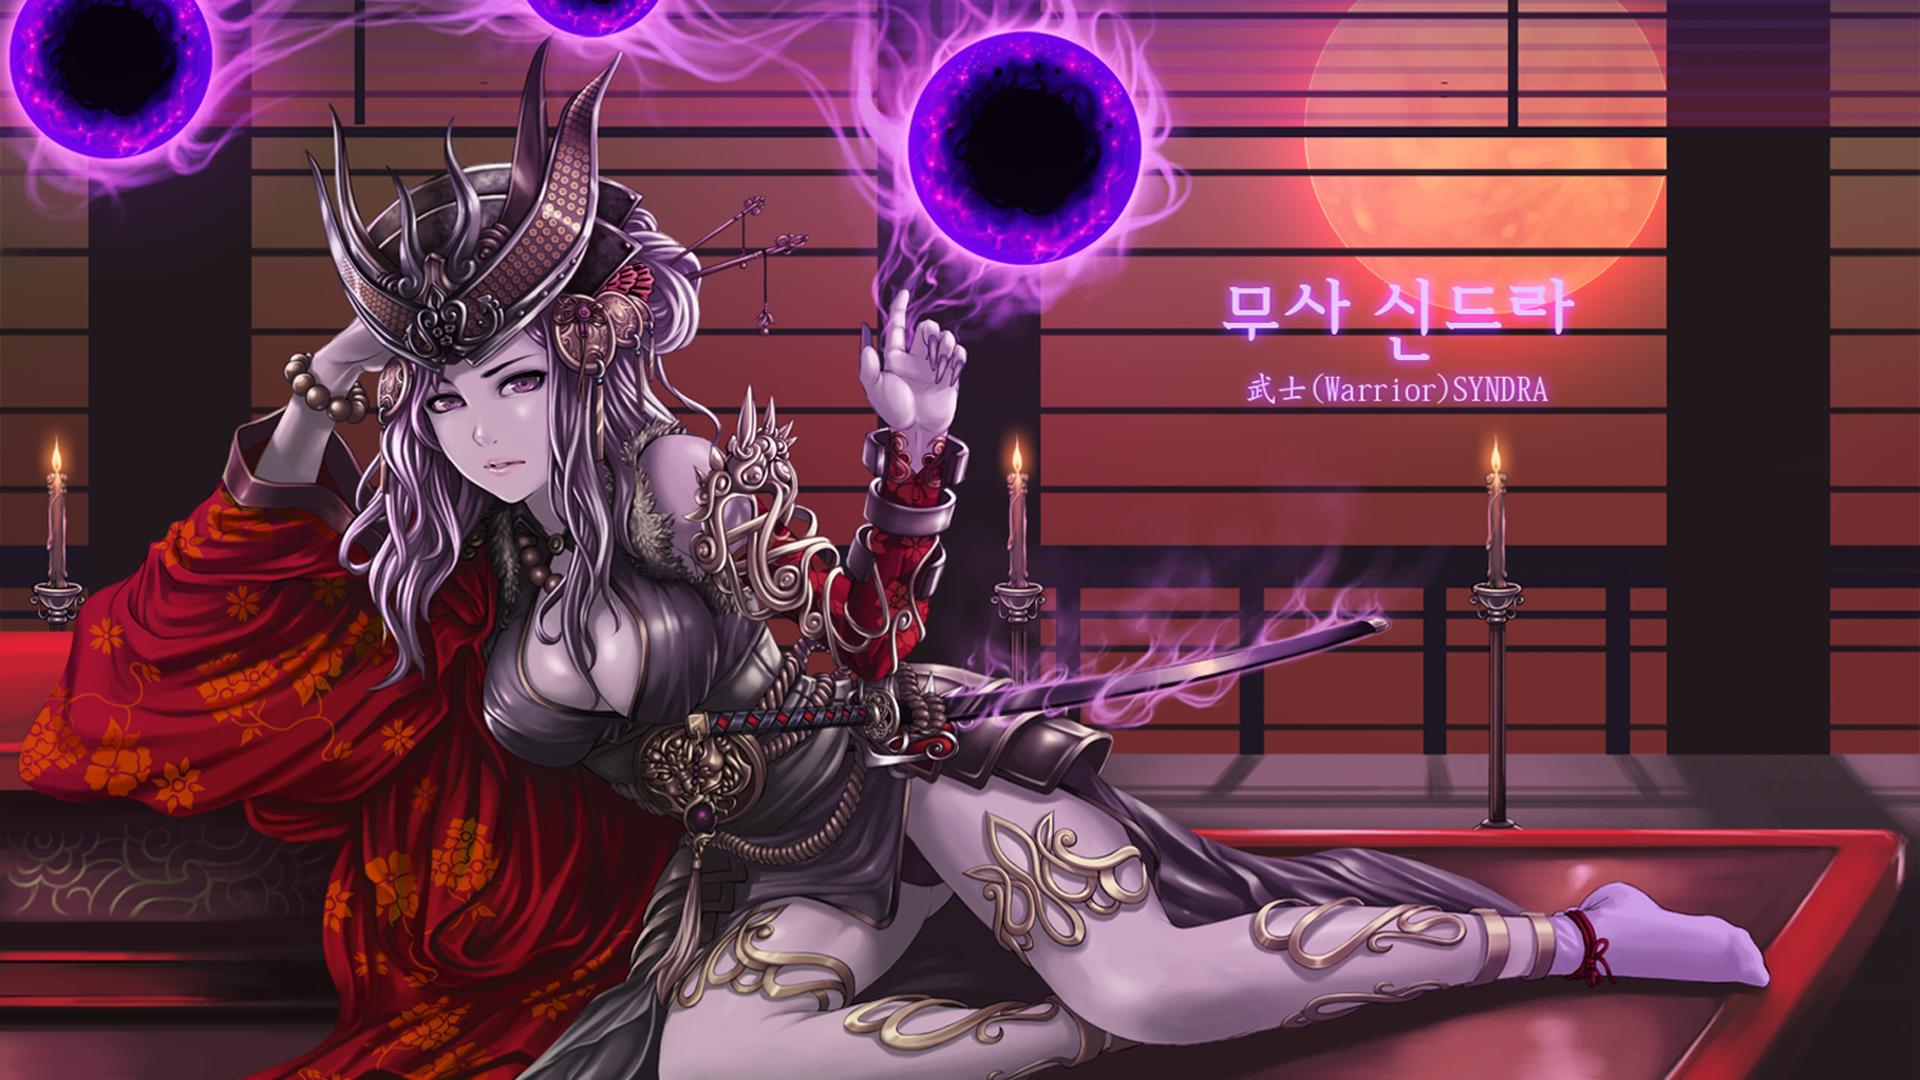 Warrior Syndra Art Wallpaper HD